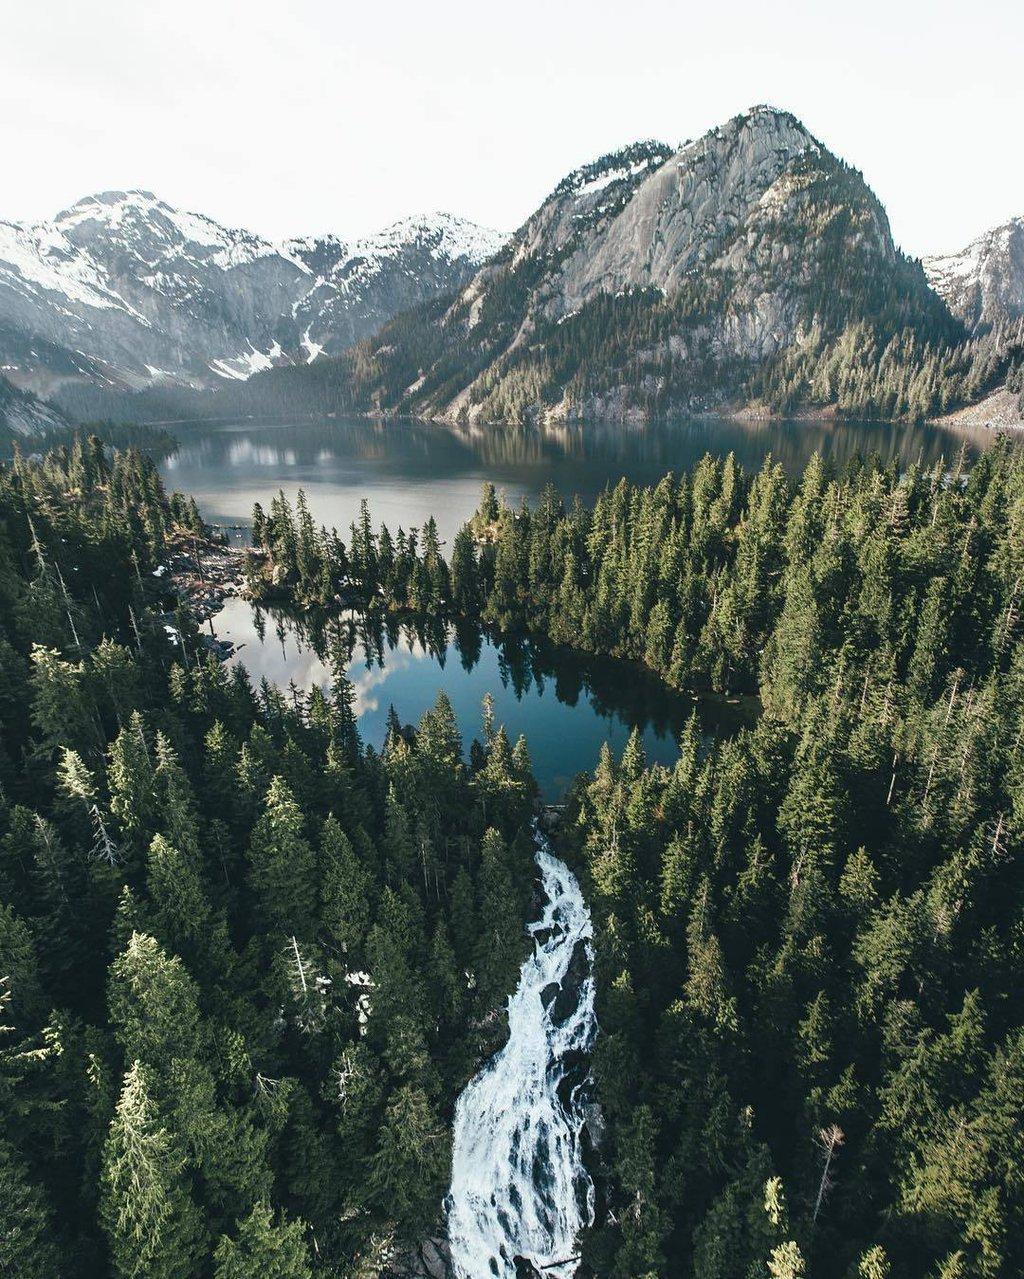 Widegon Lake, British Columbia, Canada | Photography by ©@furstyphoto https://t.co/YfgSmuEjeC